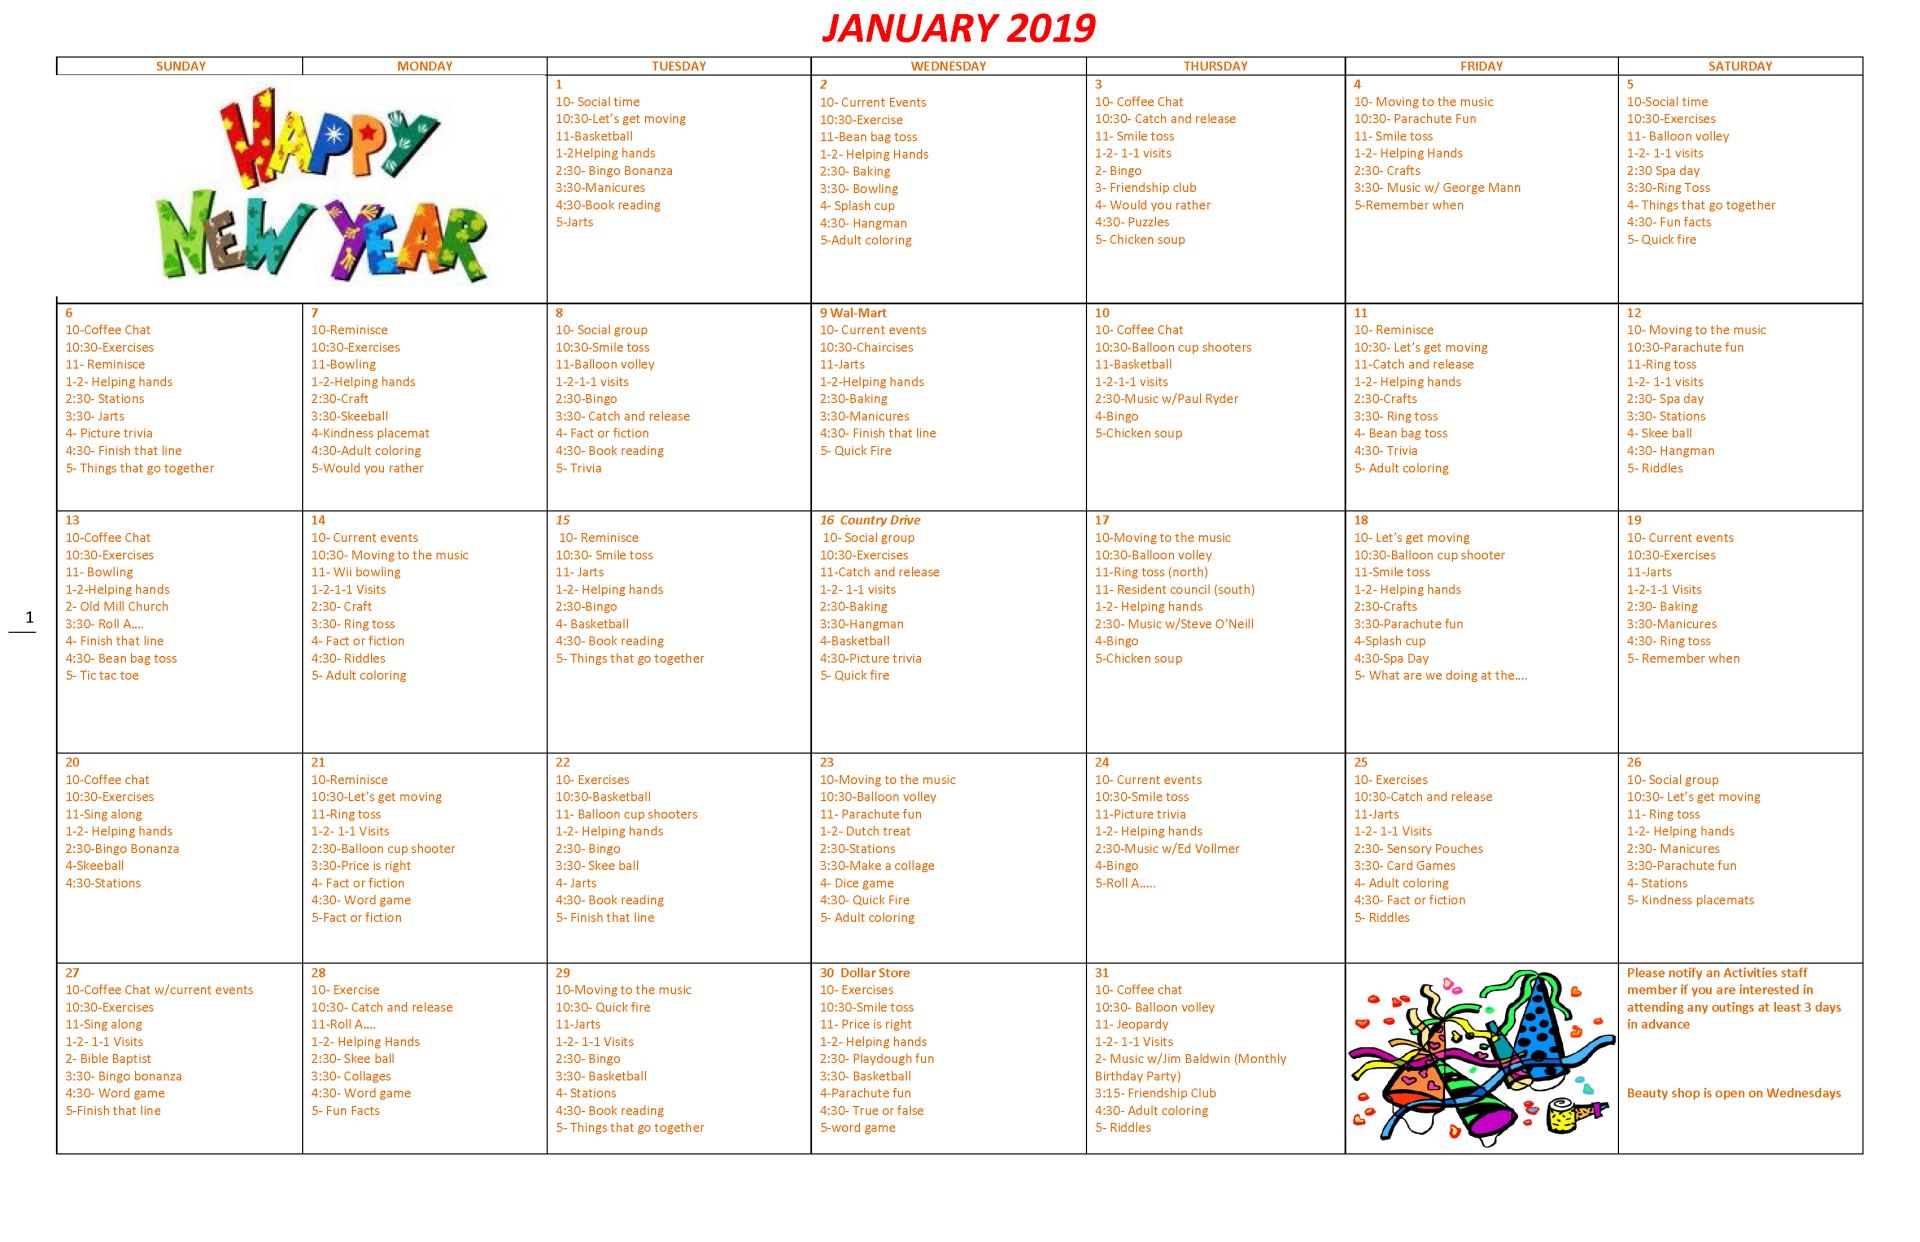 norwich events calendar